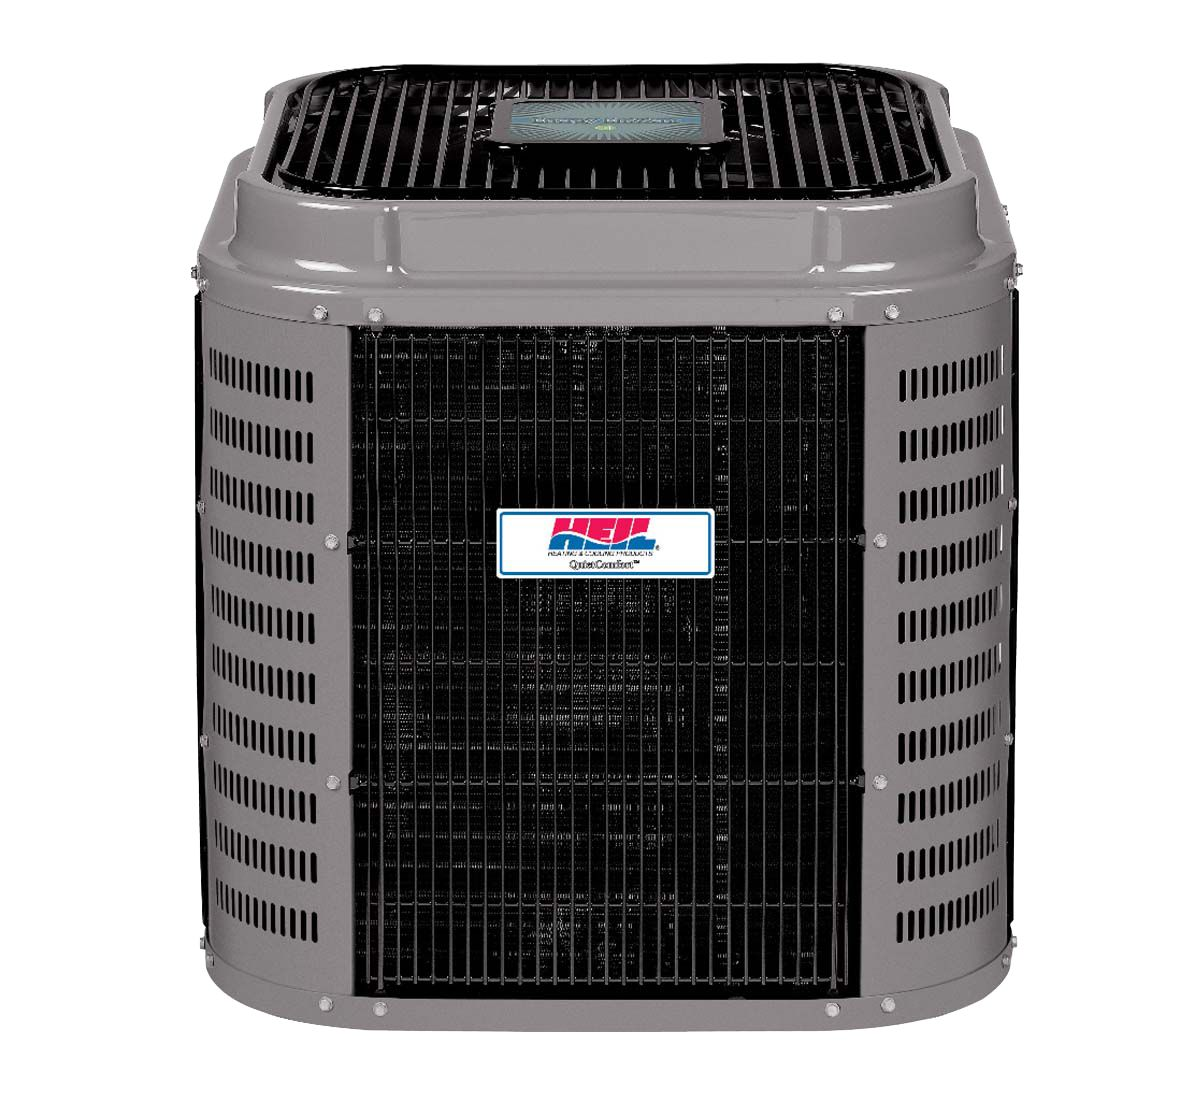 Central Air Conditioner Hsa6 Heil